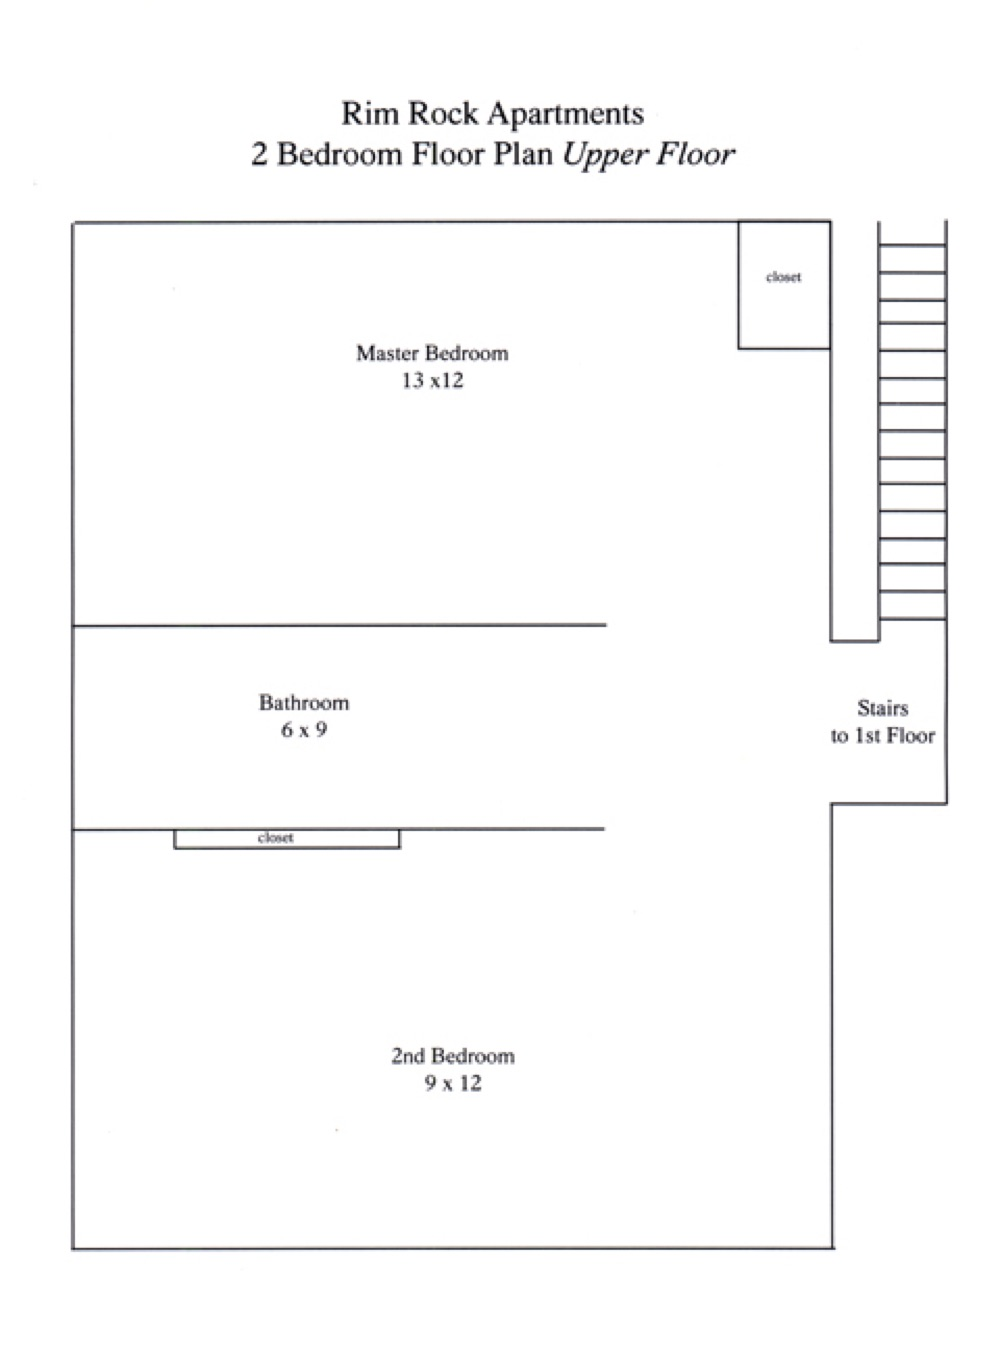 Two Bedroom One and a Half Floor Plan - Second Floor